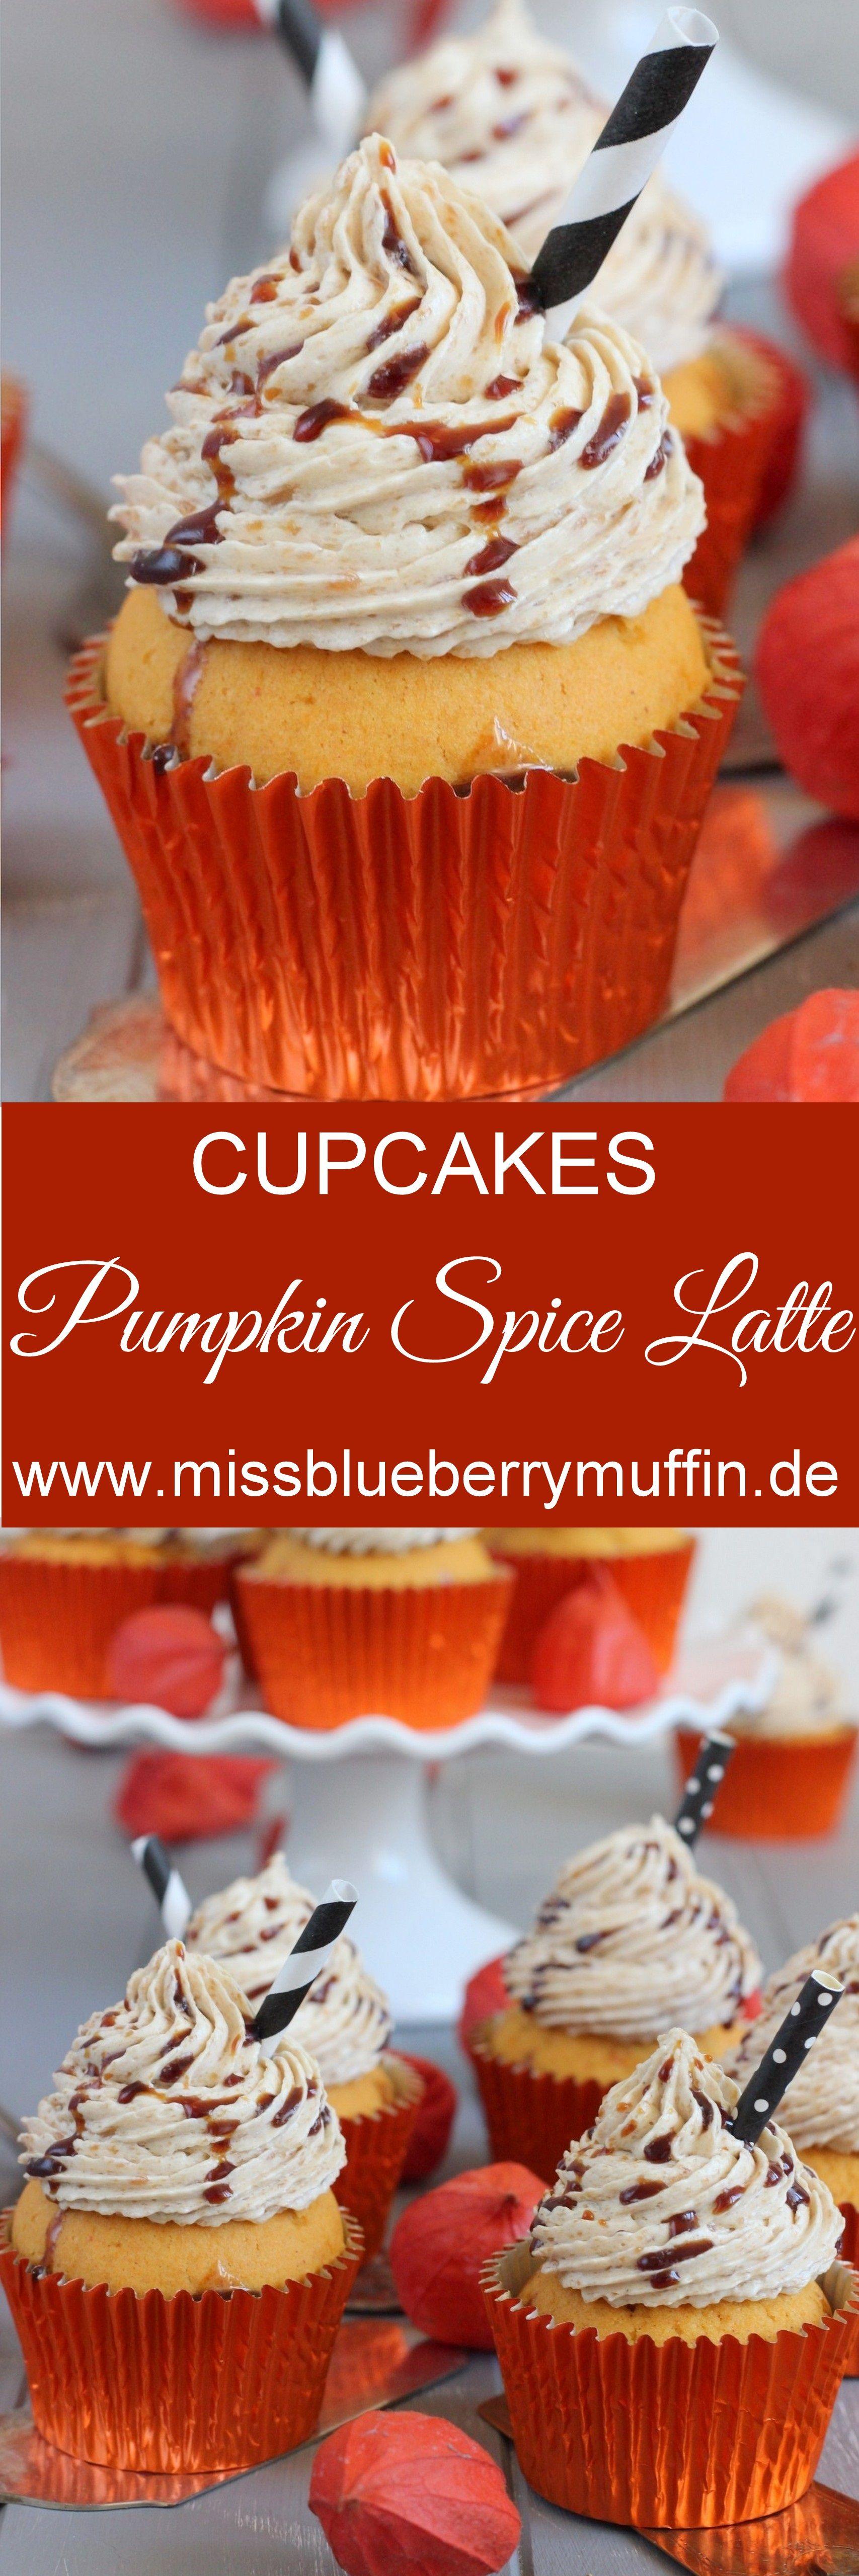 [Anzeige] Pumpkin Spice Latte Cupcales // Kürbis Cupcakes mit Kaffeebuttercreme <3